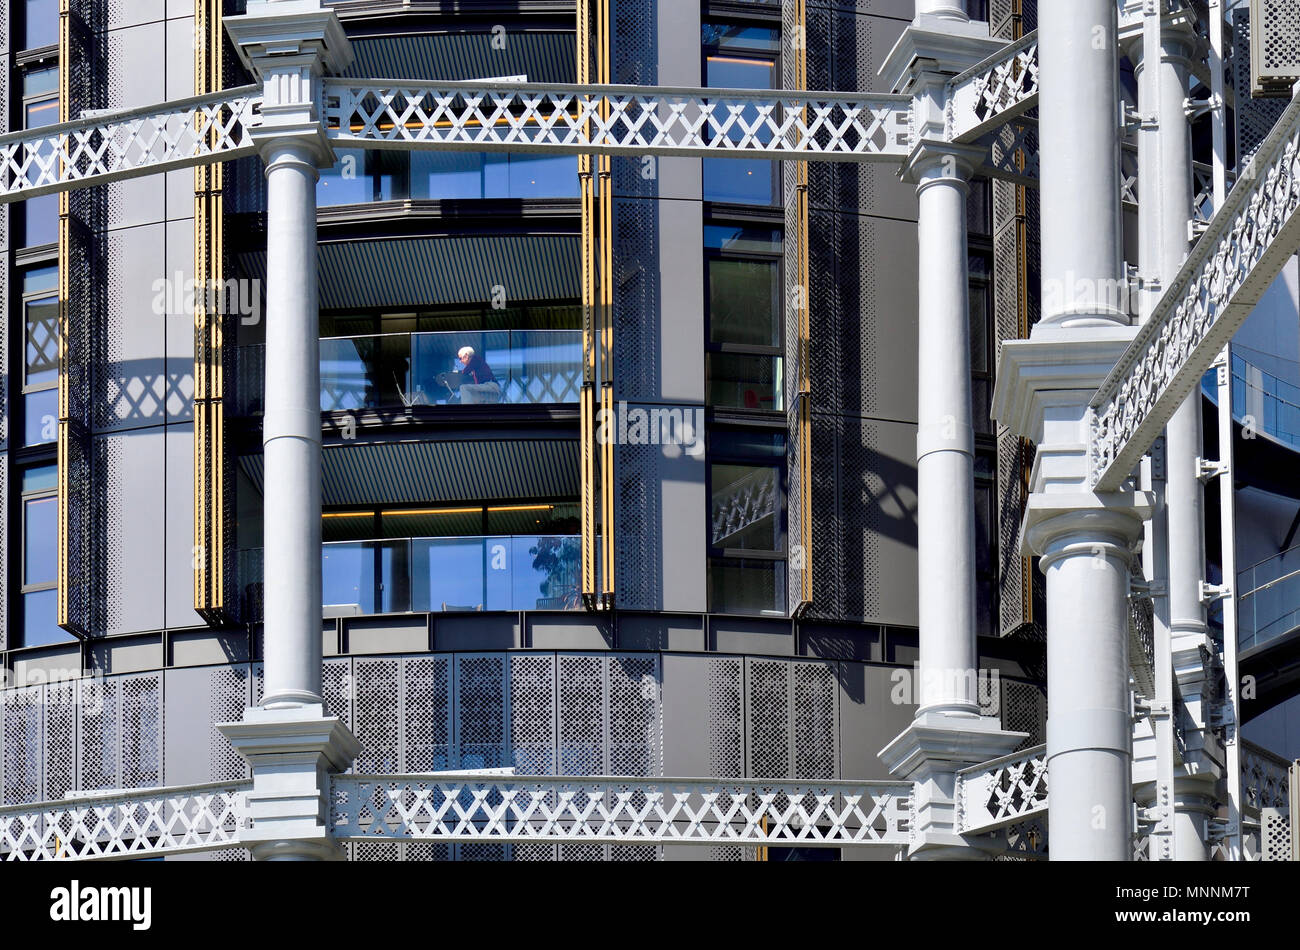 Gasholder Apartments, Lewis Cubitt Square, Kings Cross, London, England, UK. Luxury flats built in Grade II listed gasholders - man sitting on his bal - Stock Image